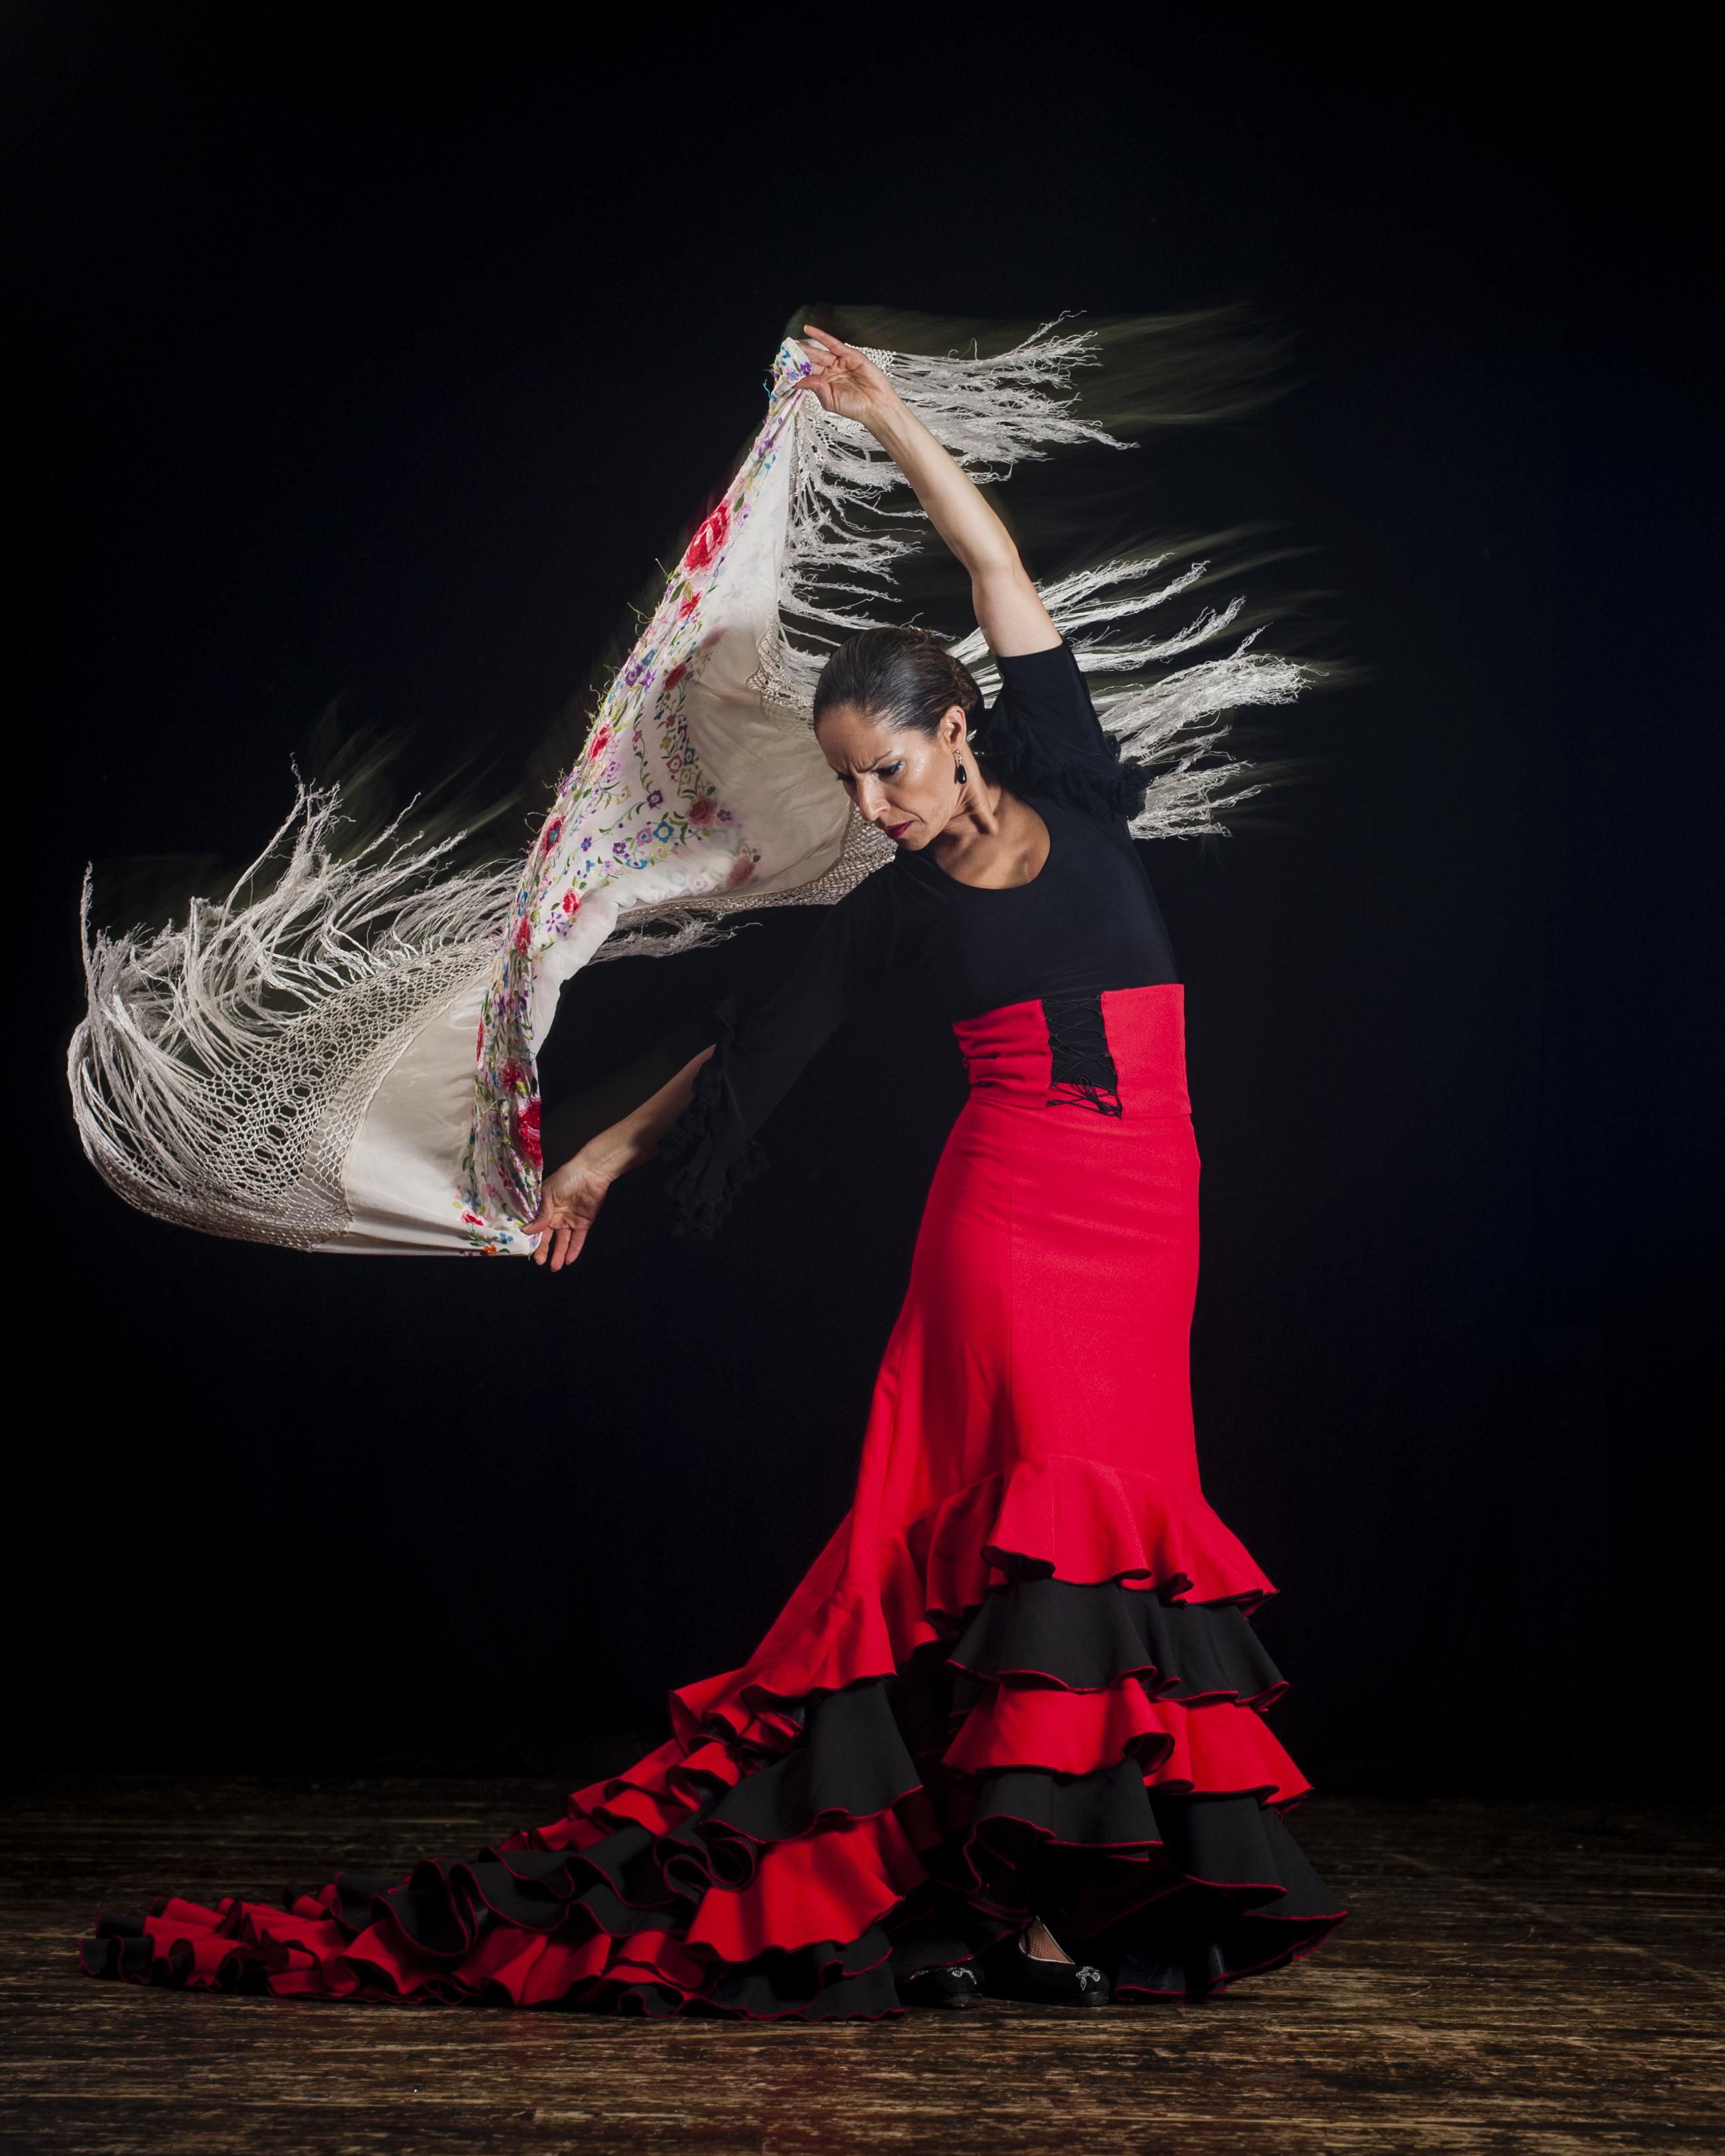 File:Flamenco dancer 3467.jpg - Wikimedia Commons